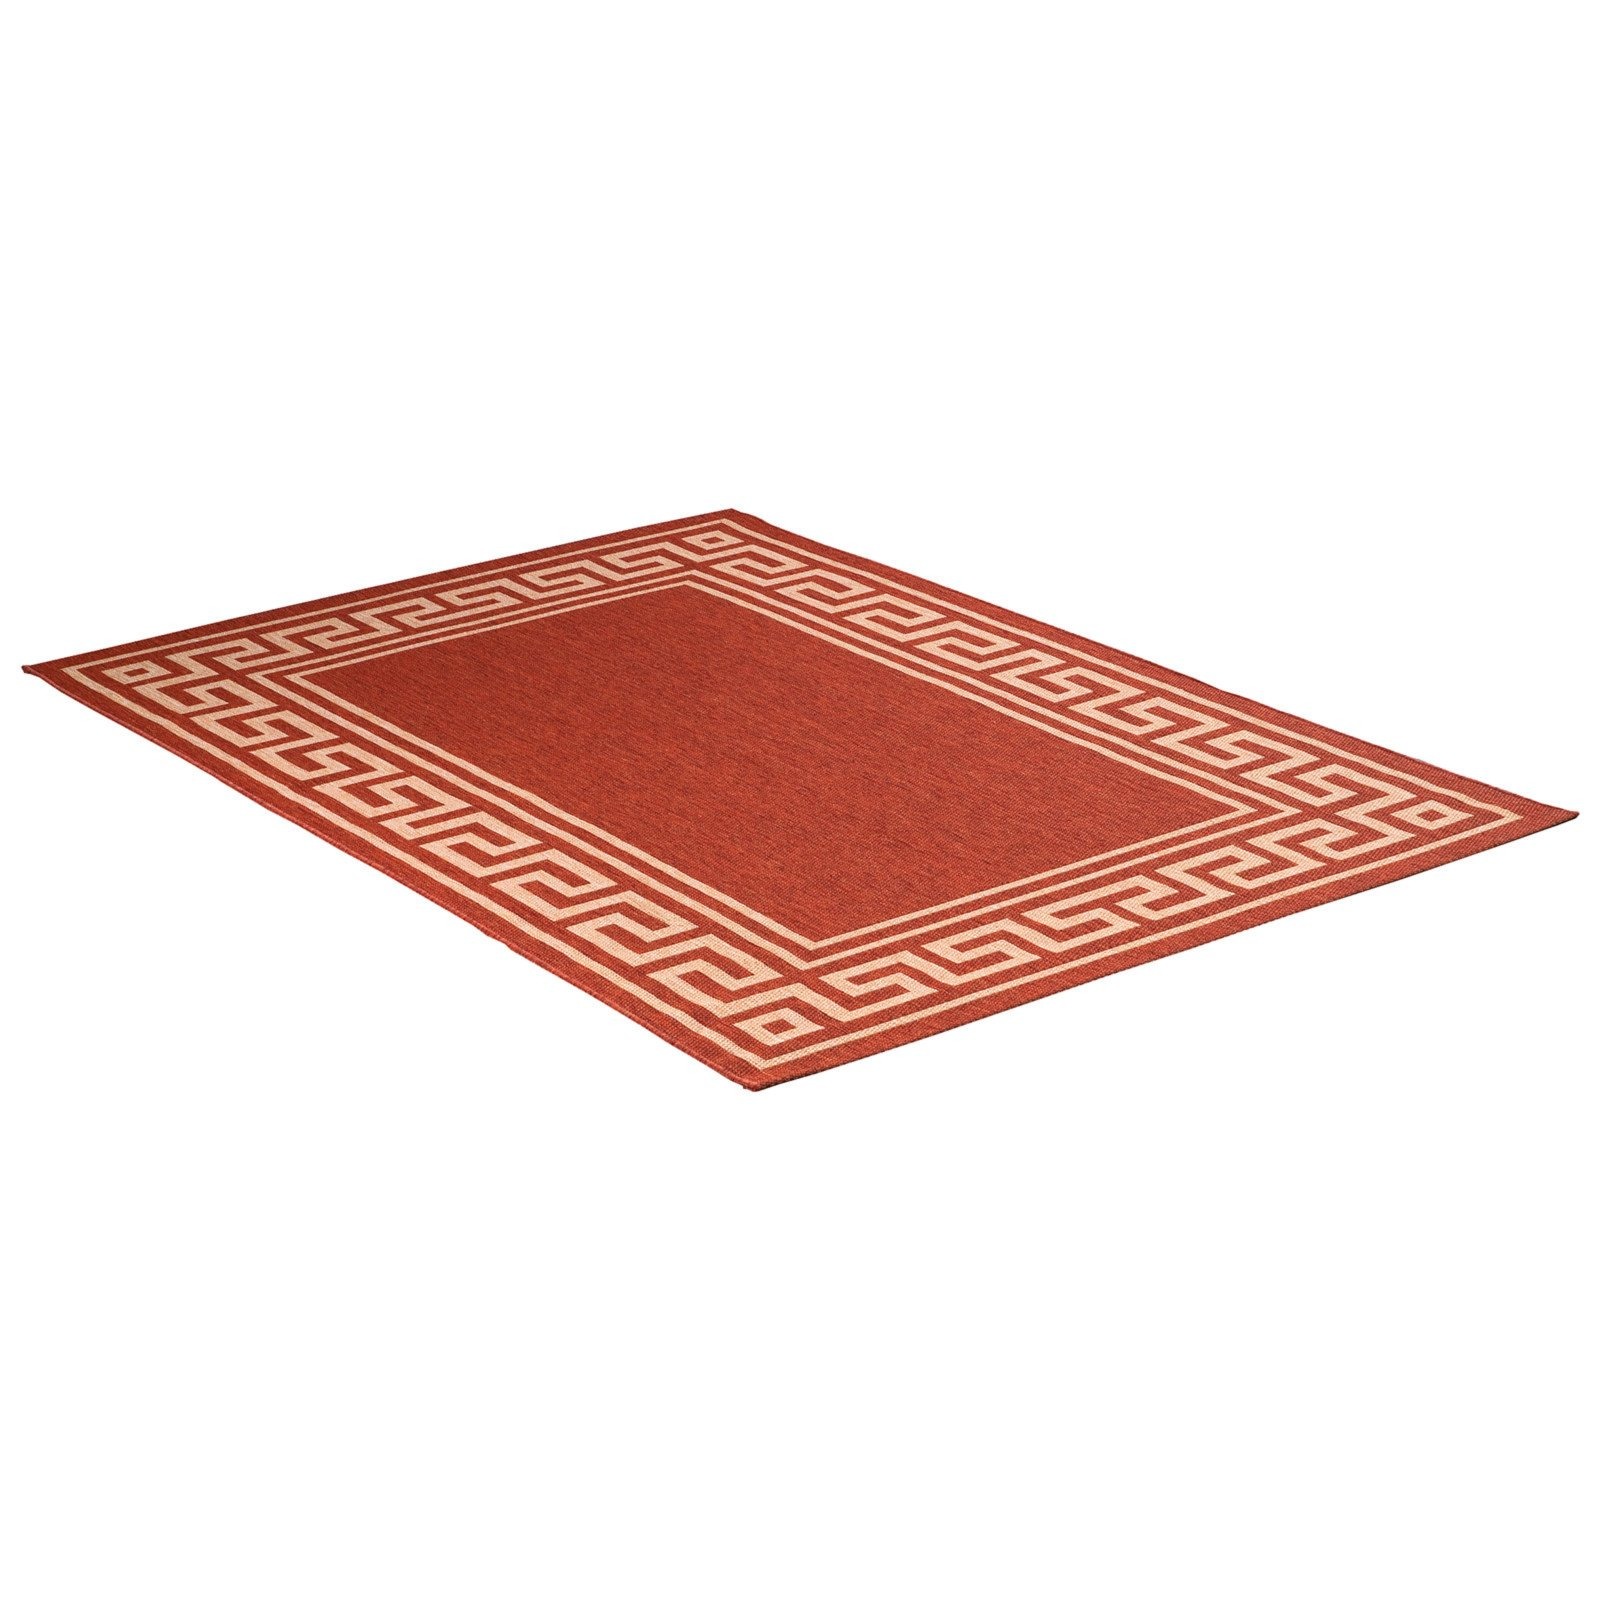 in outdoorteppich oslo terracotta 80x340 cm gemusterte teppiche teppiche l ufer. Black Bedroom Furniture Sets. Home Design Ideas